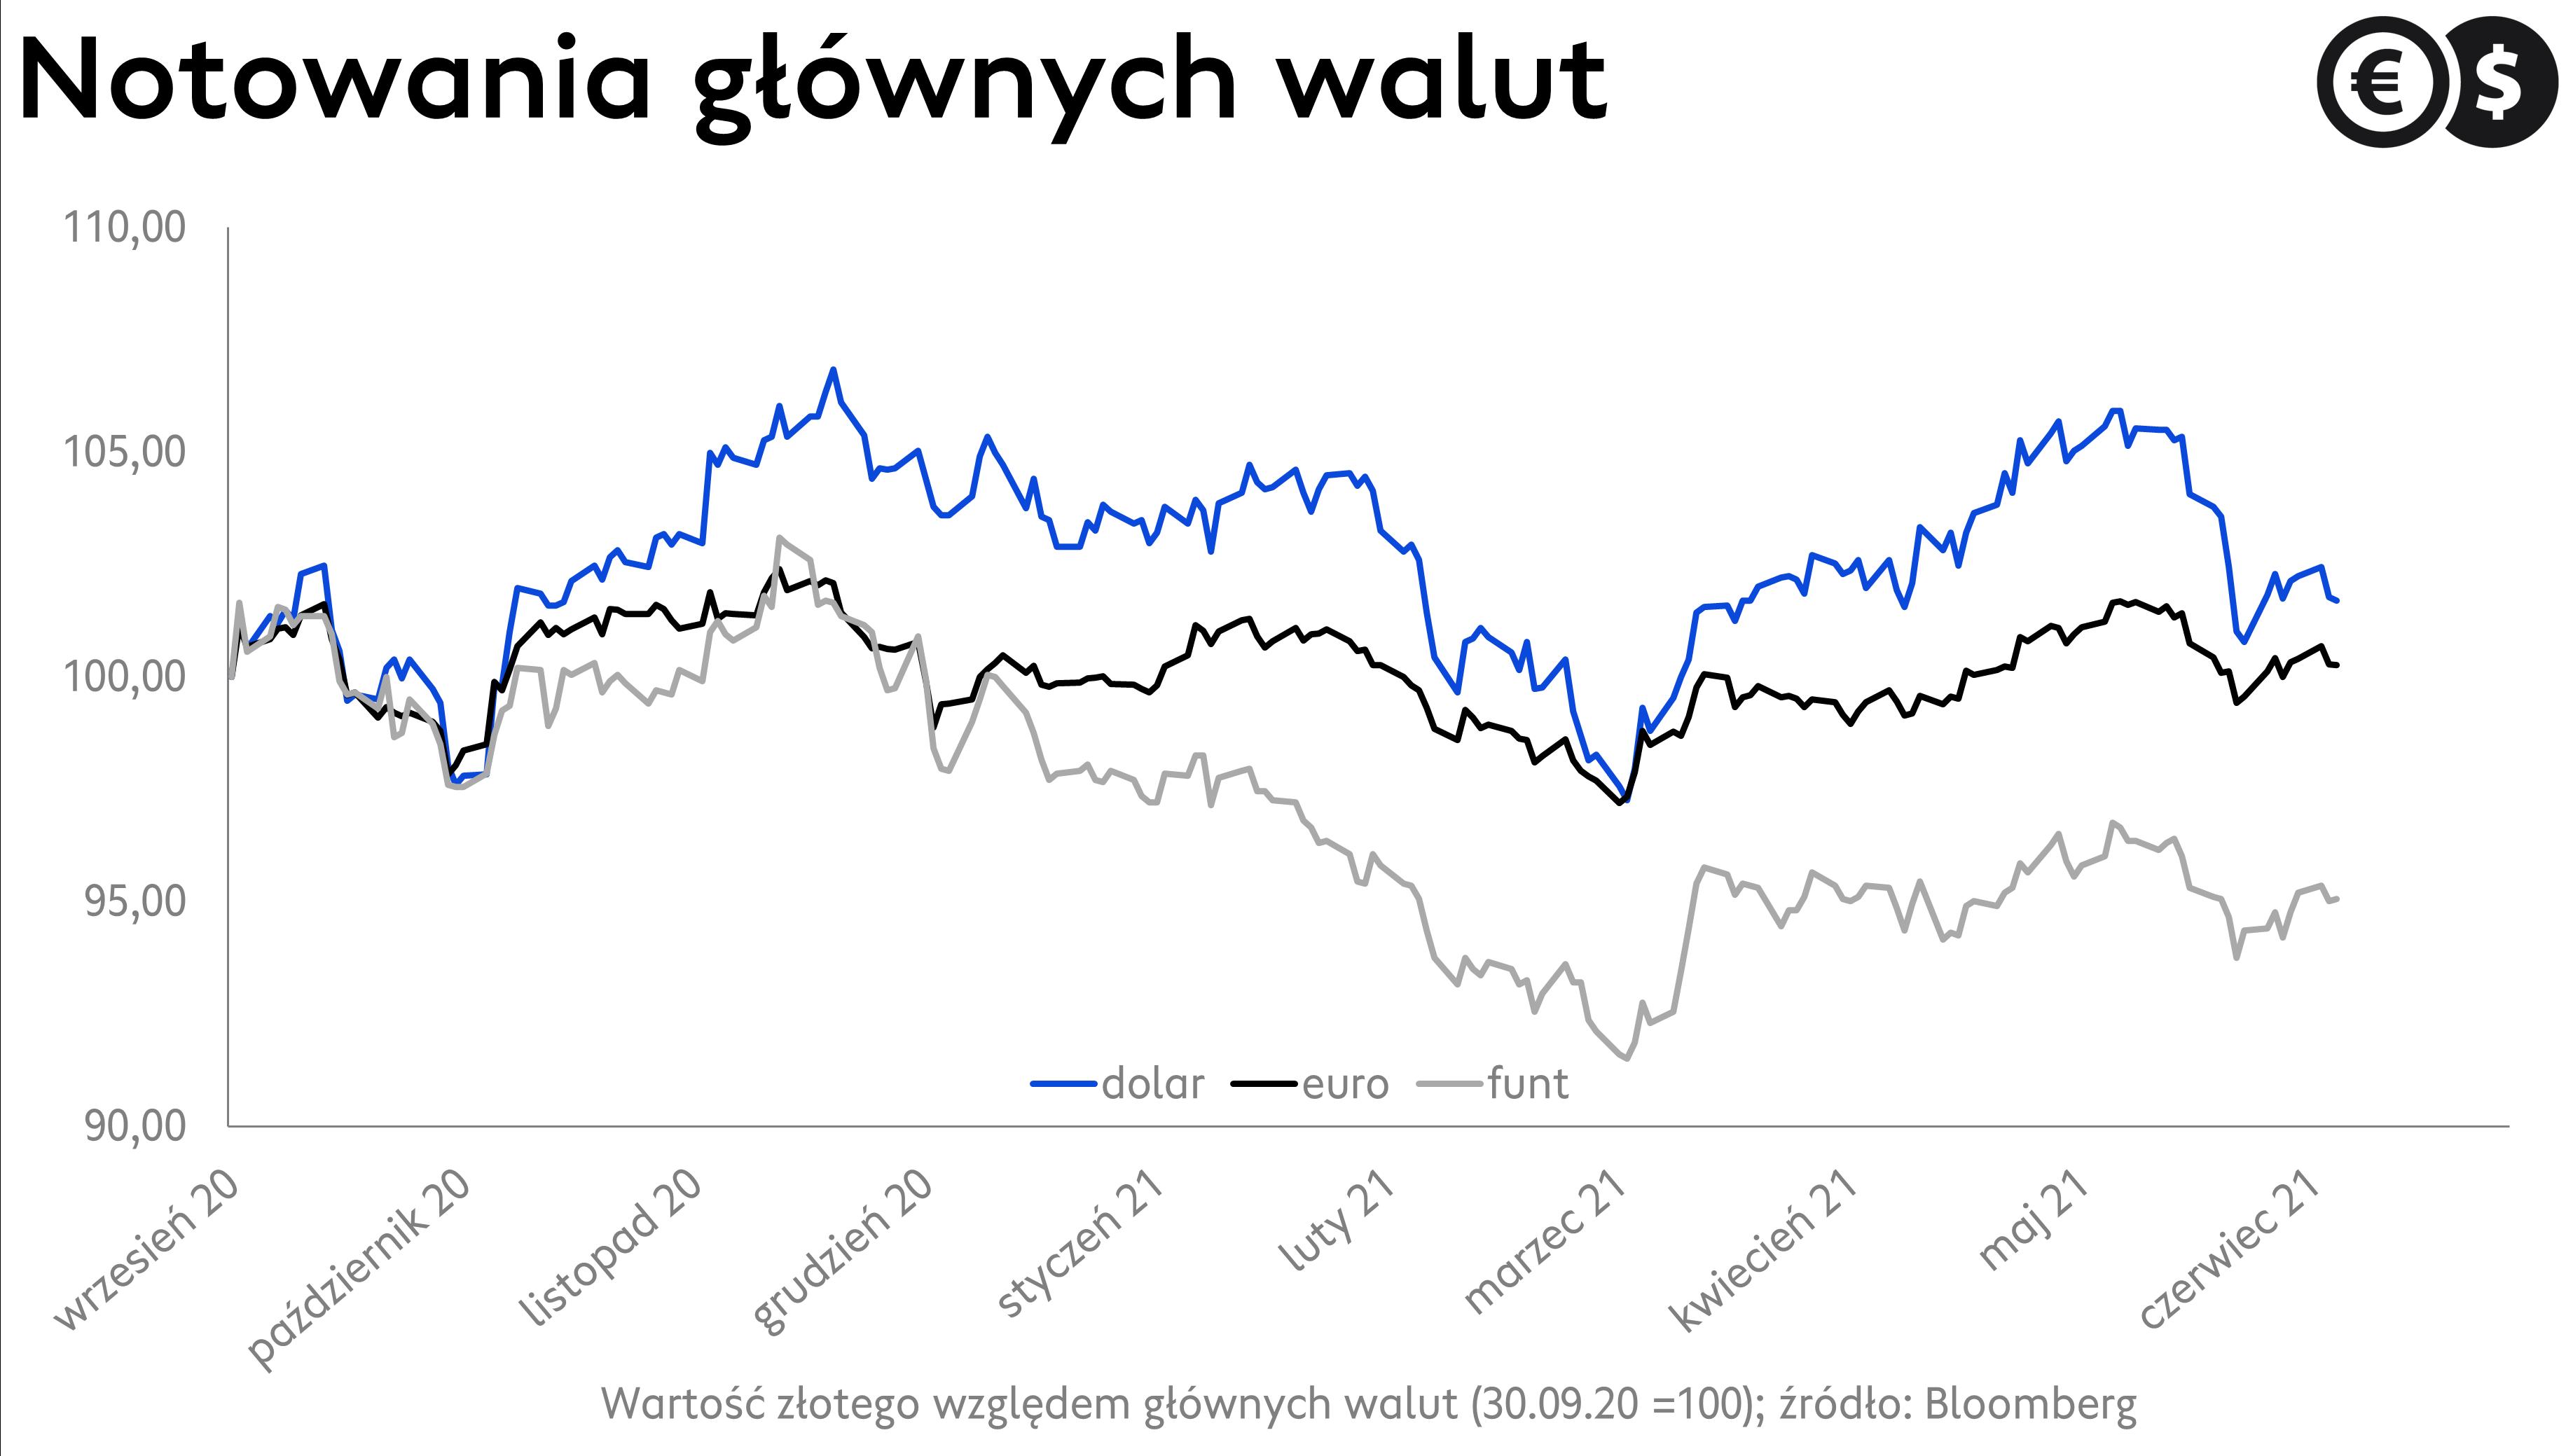 Kursy walut: kurs euro, kurs dolara i kurs funta; źródło: Bloomberg